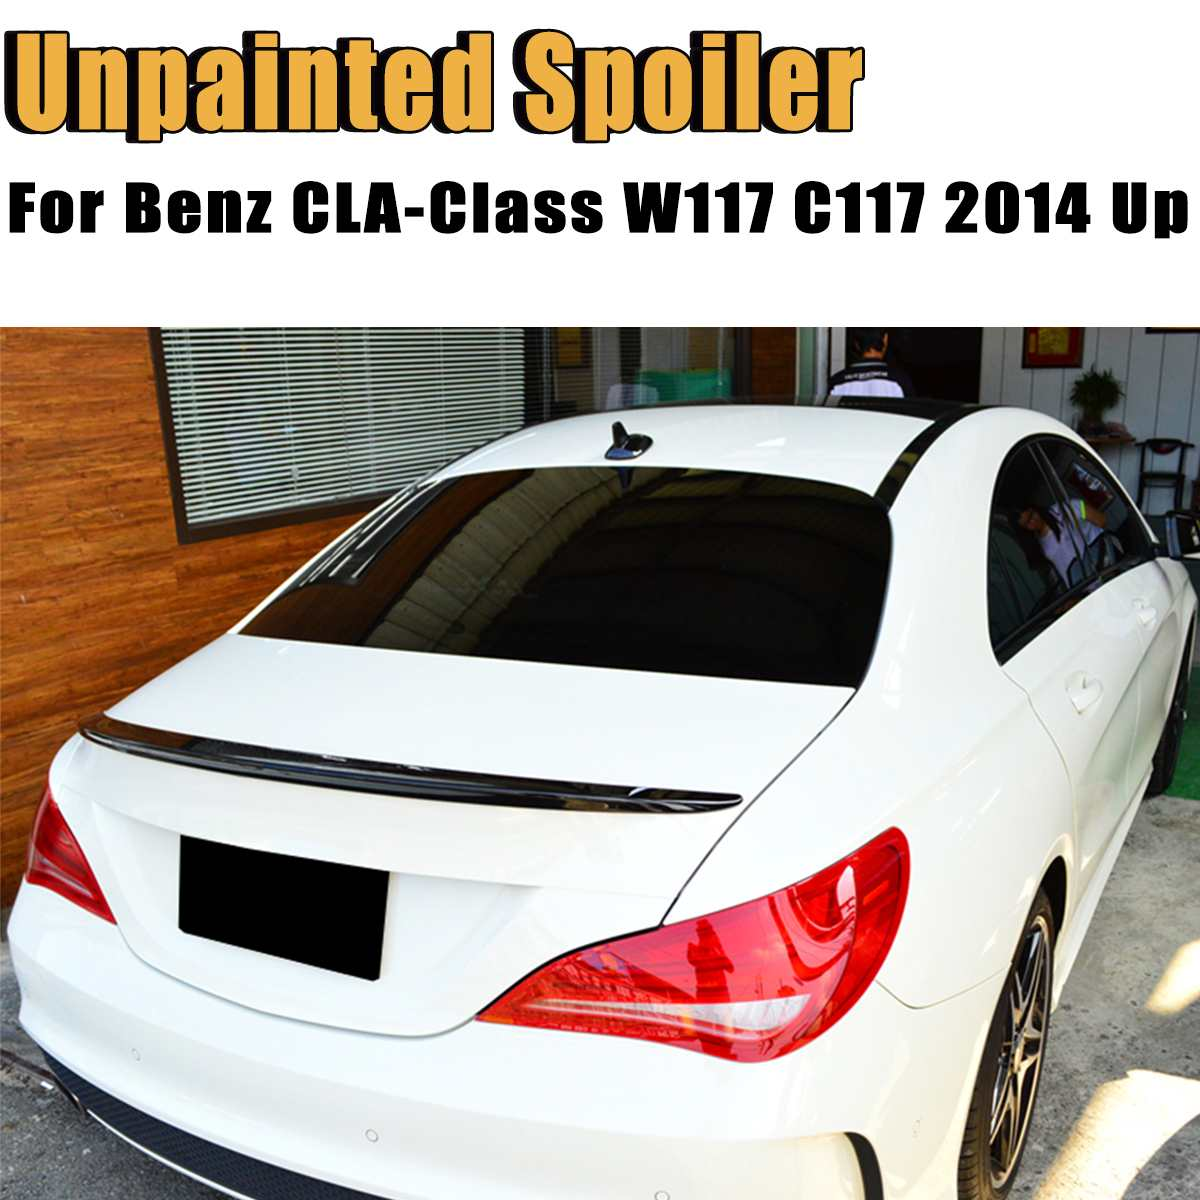 Rear Trunk Boot Lip ABS Spoiler Wing for Mercedes-Benz CLA Class W117 C117 2014 Up Trim Sticker Spoiler Car StylingRear Trunk Boot Lip ABS Spoiler Wing for Mercedes-Benz CLA Class W117 C117 2014 Up Trim Sticker Spoiler Car Styling